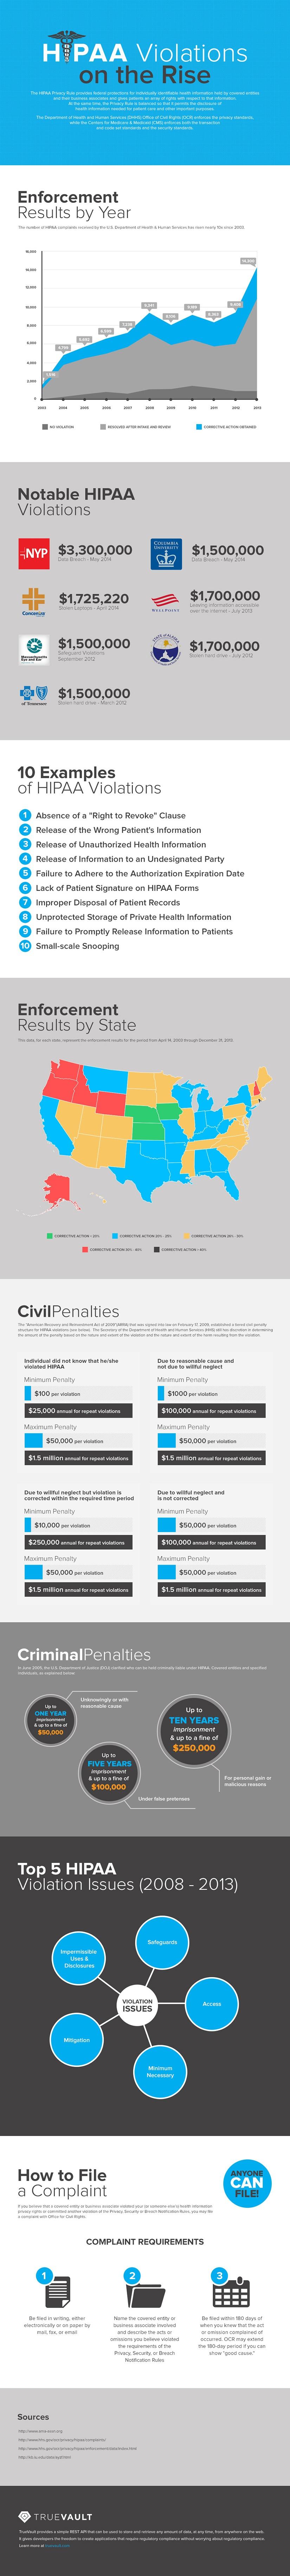 hipaa-violations-infographic